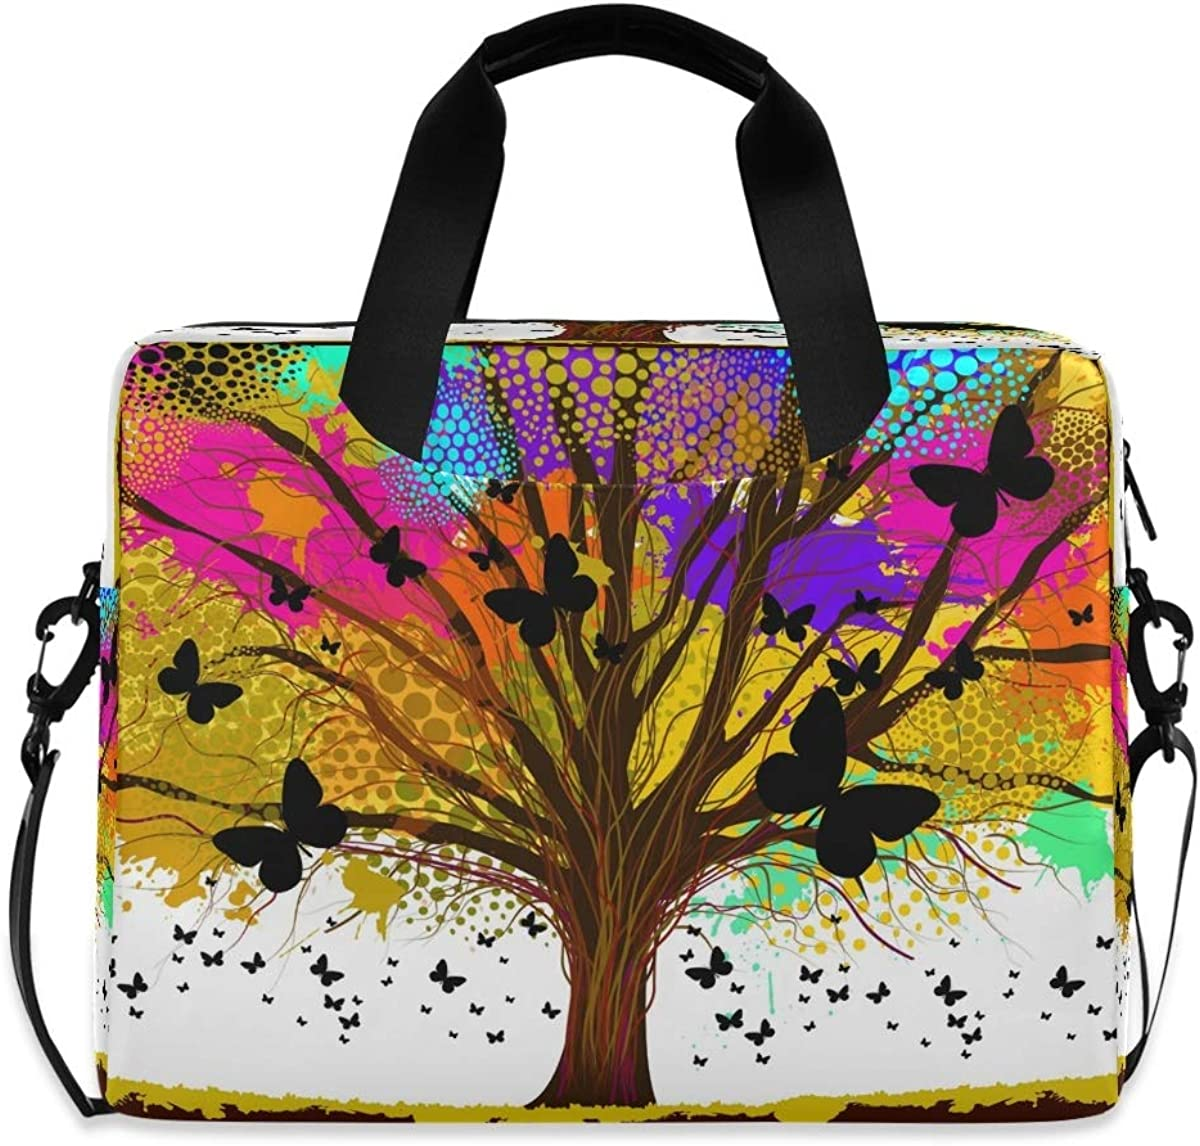 LELEGO Colorful Dot Tree Butterfly Chicago Mall 2021 model Bag Shoulder Ba Laptop